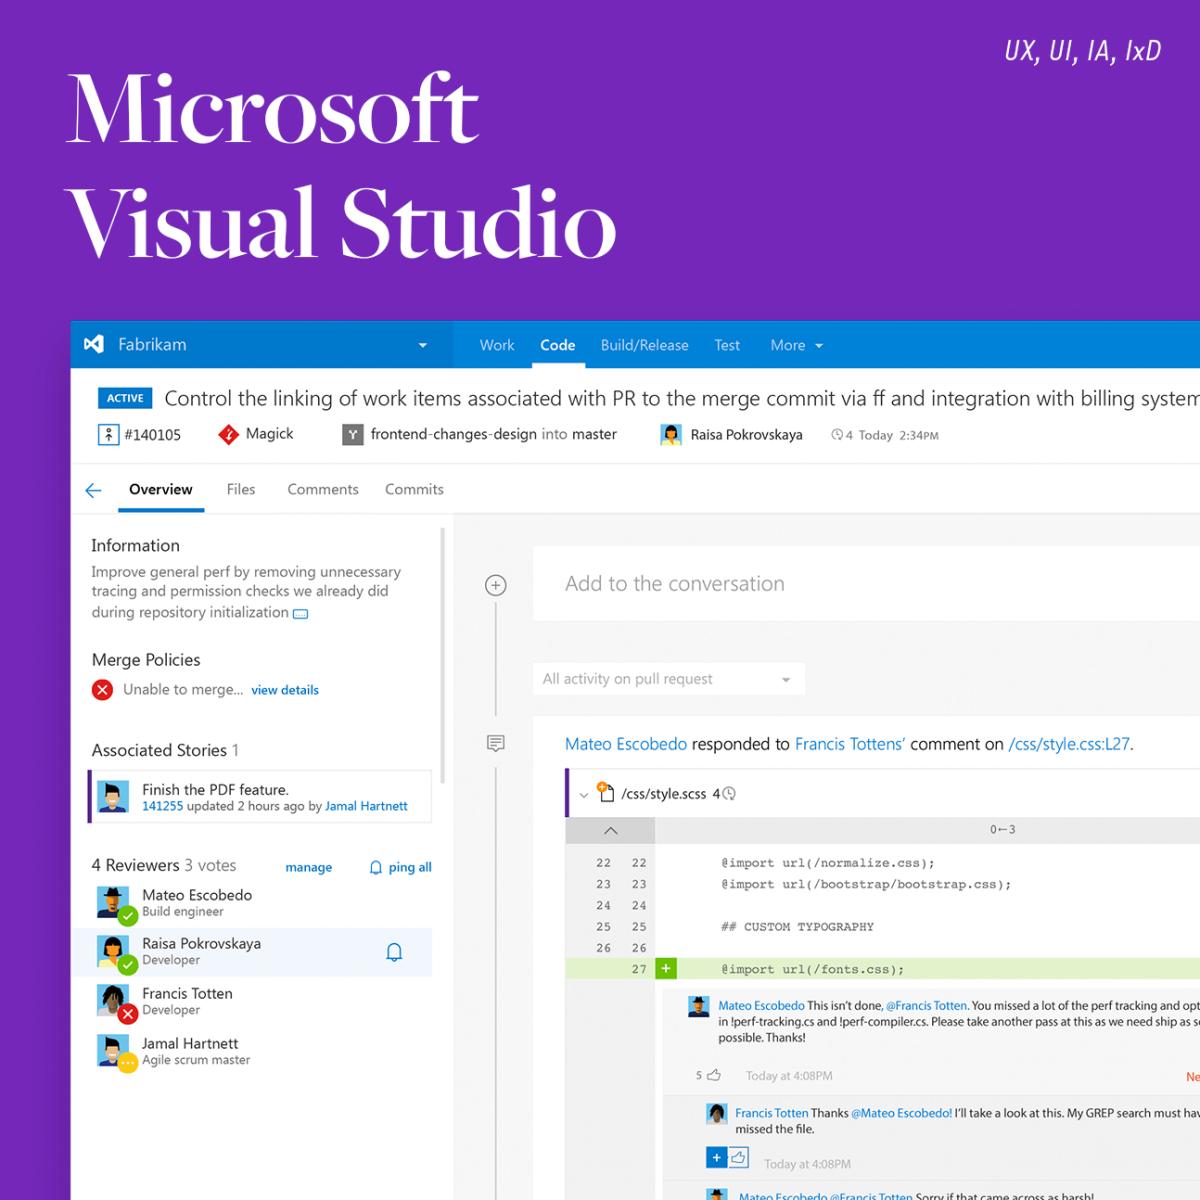 Visual Studio - Microsoft